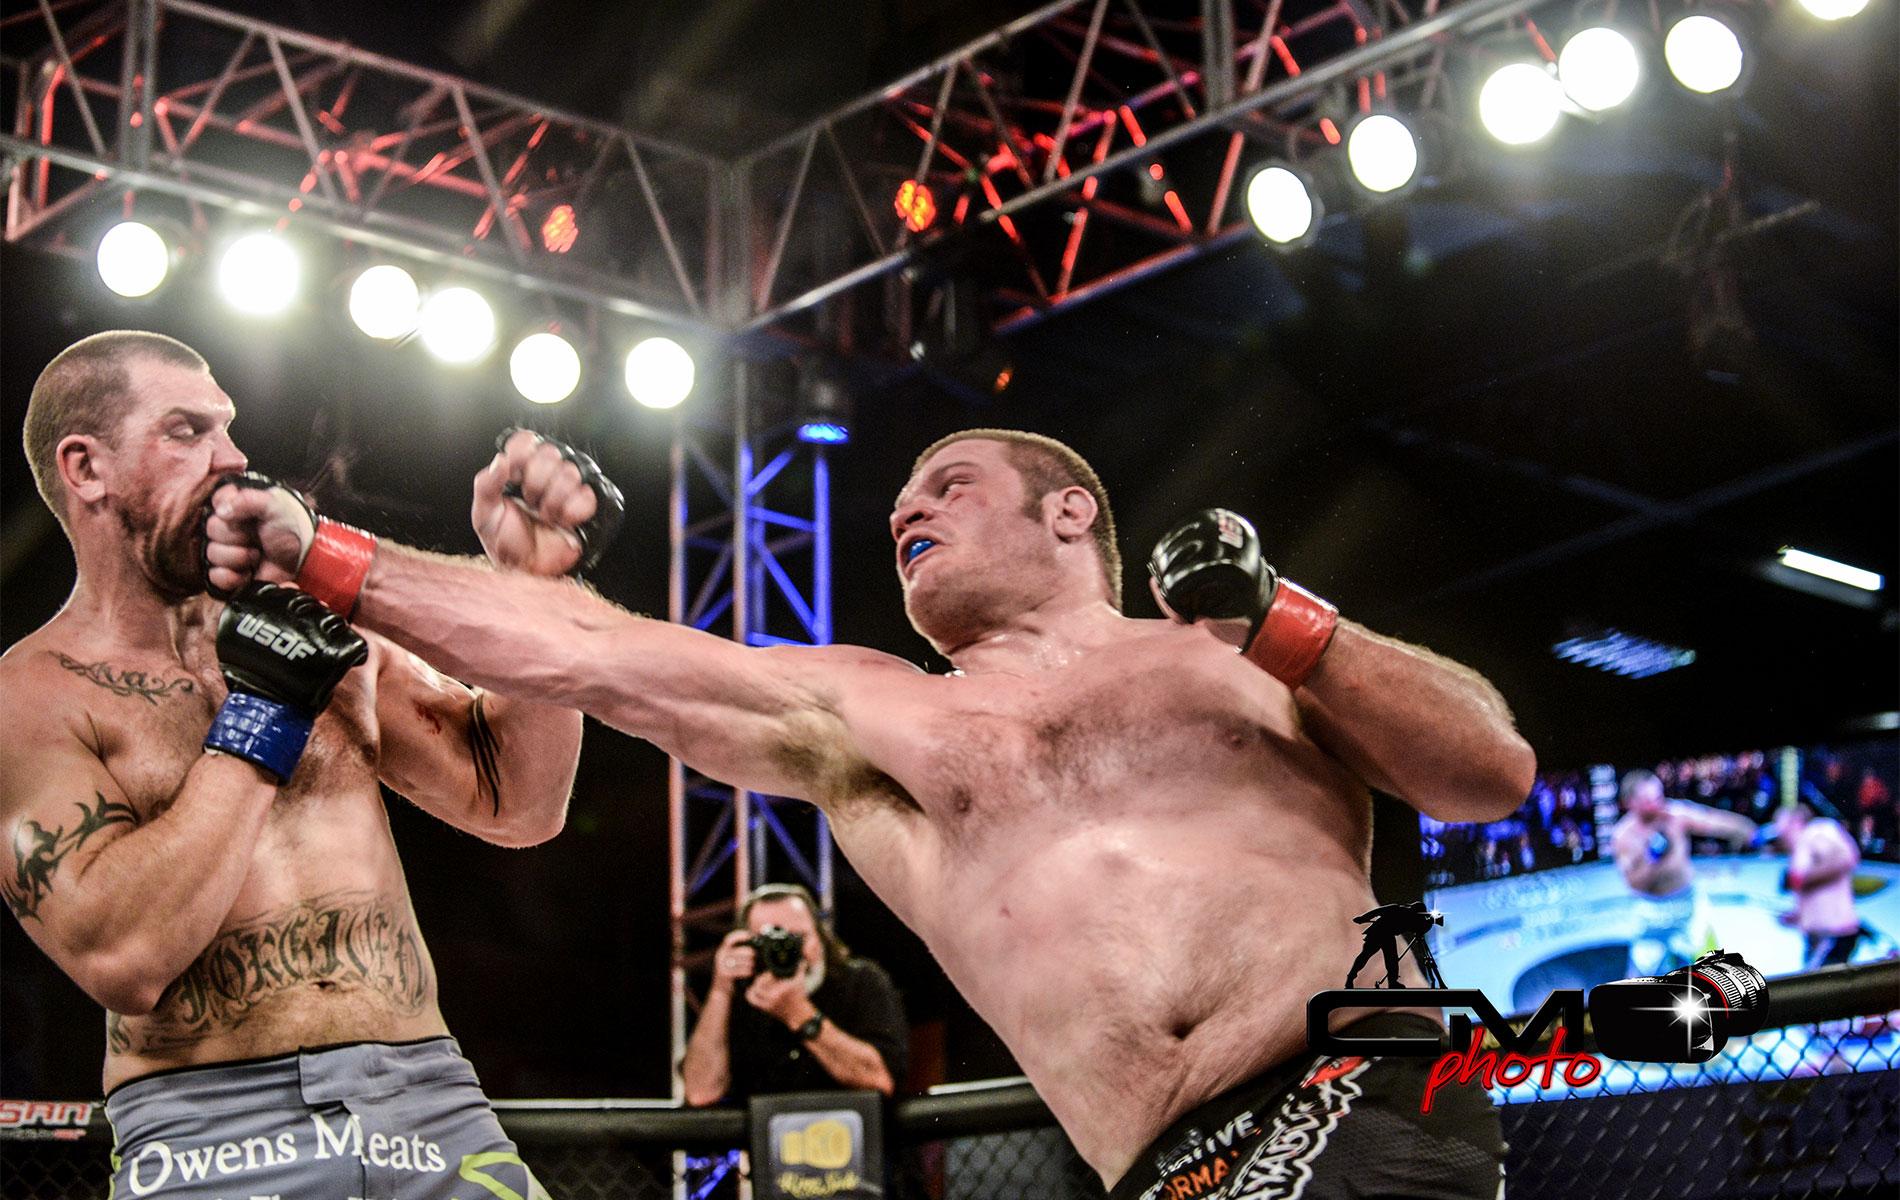 MMA Fighter testimonial